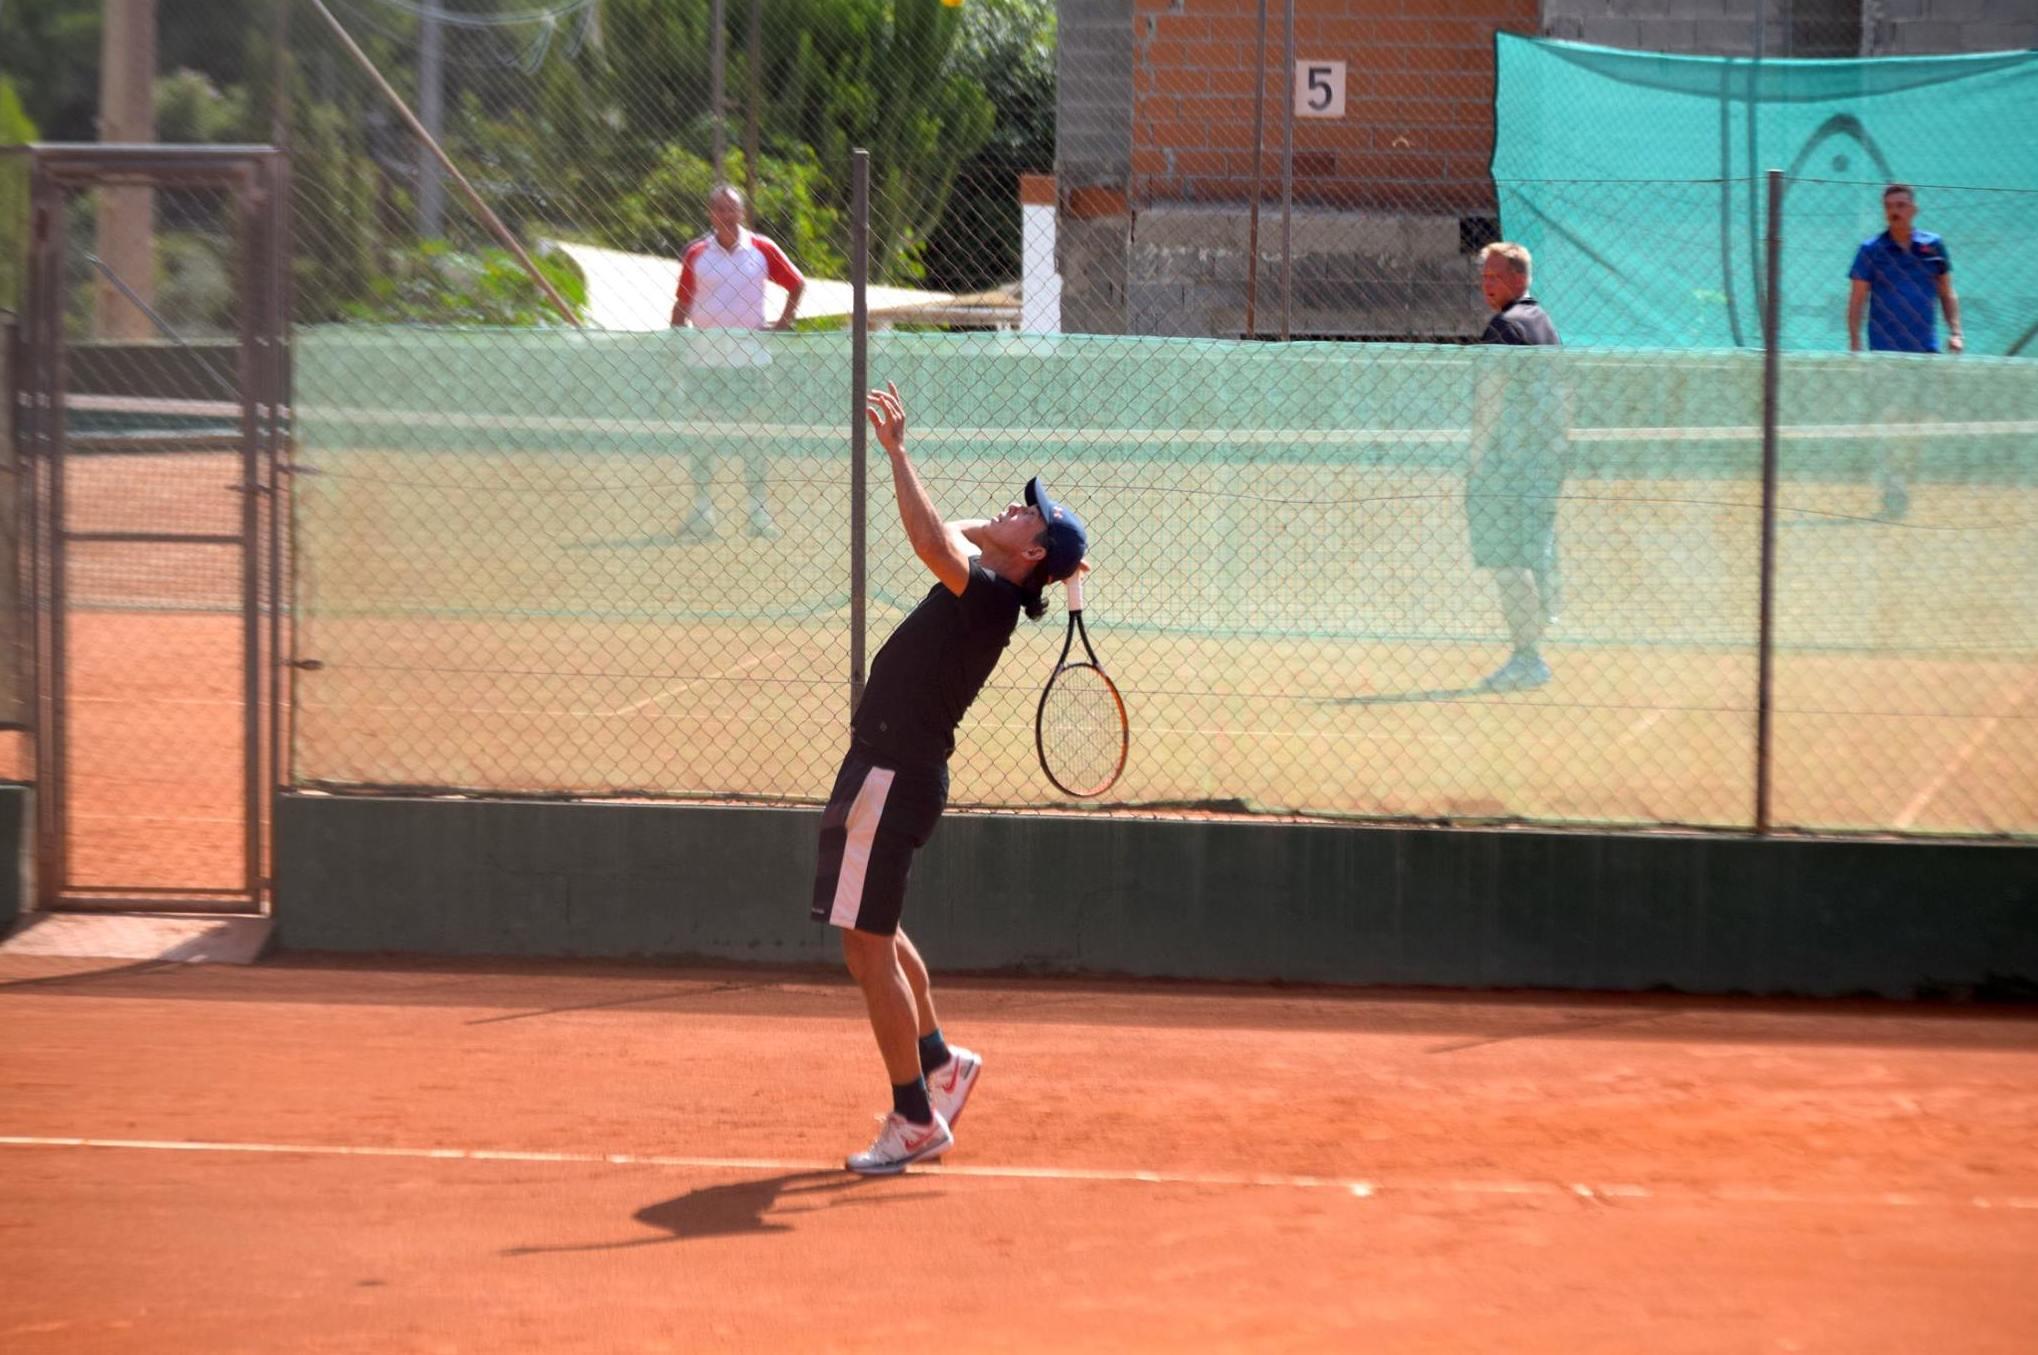 Tennis lessons in Benissa